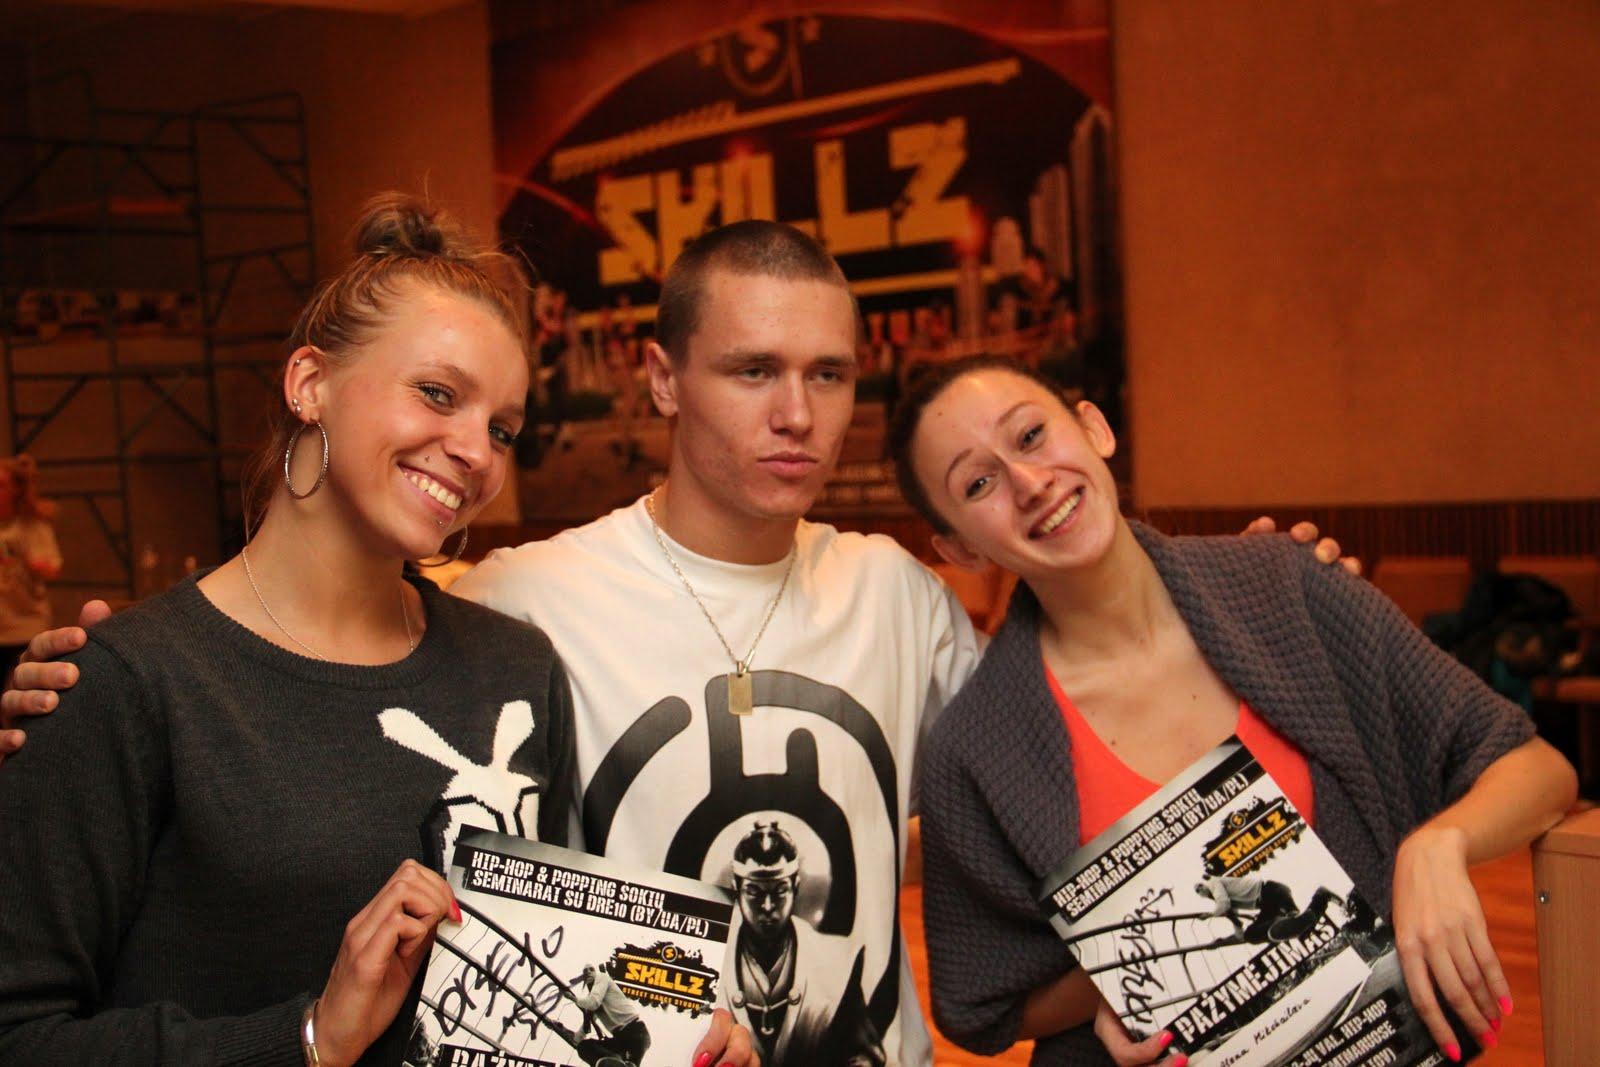 Dre10 Workshop @SKILLZ - IMG_5671.JPG